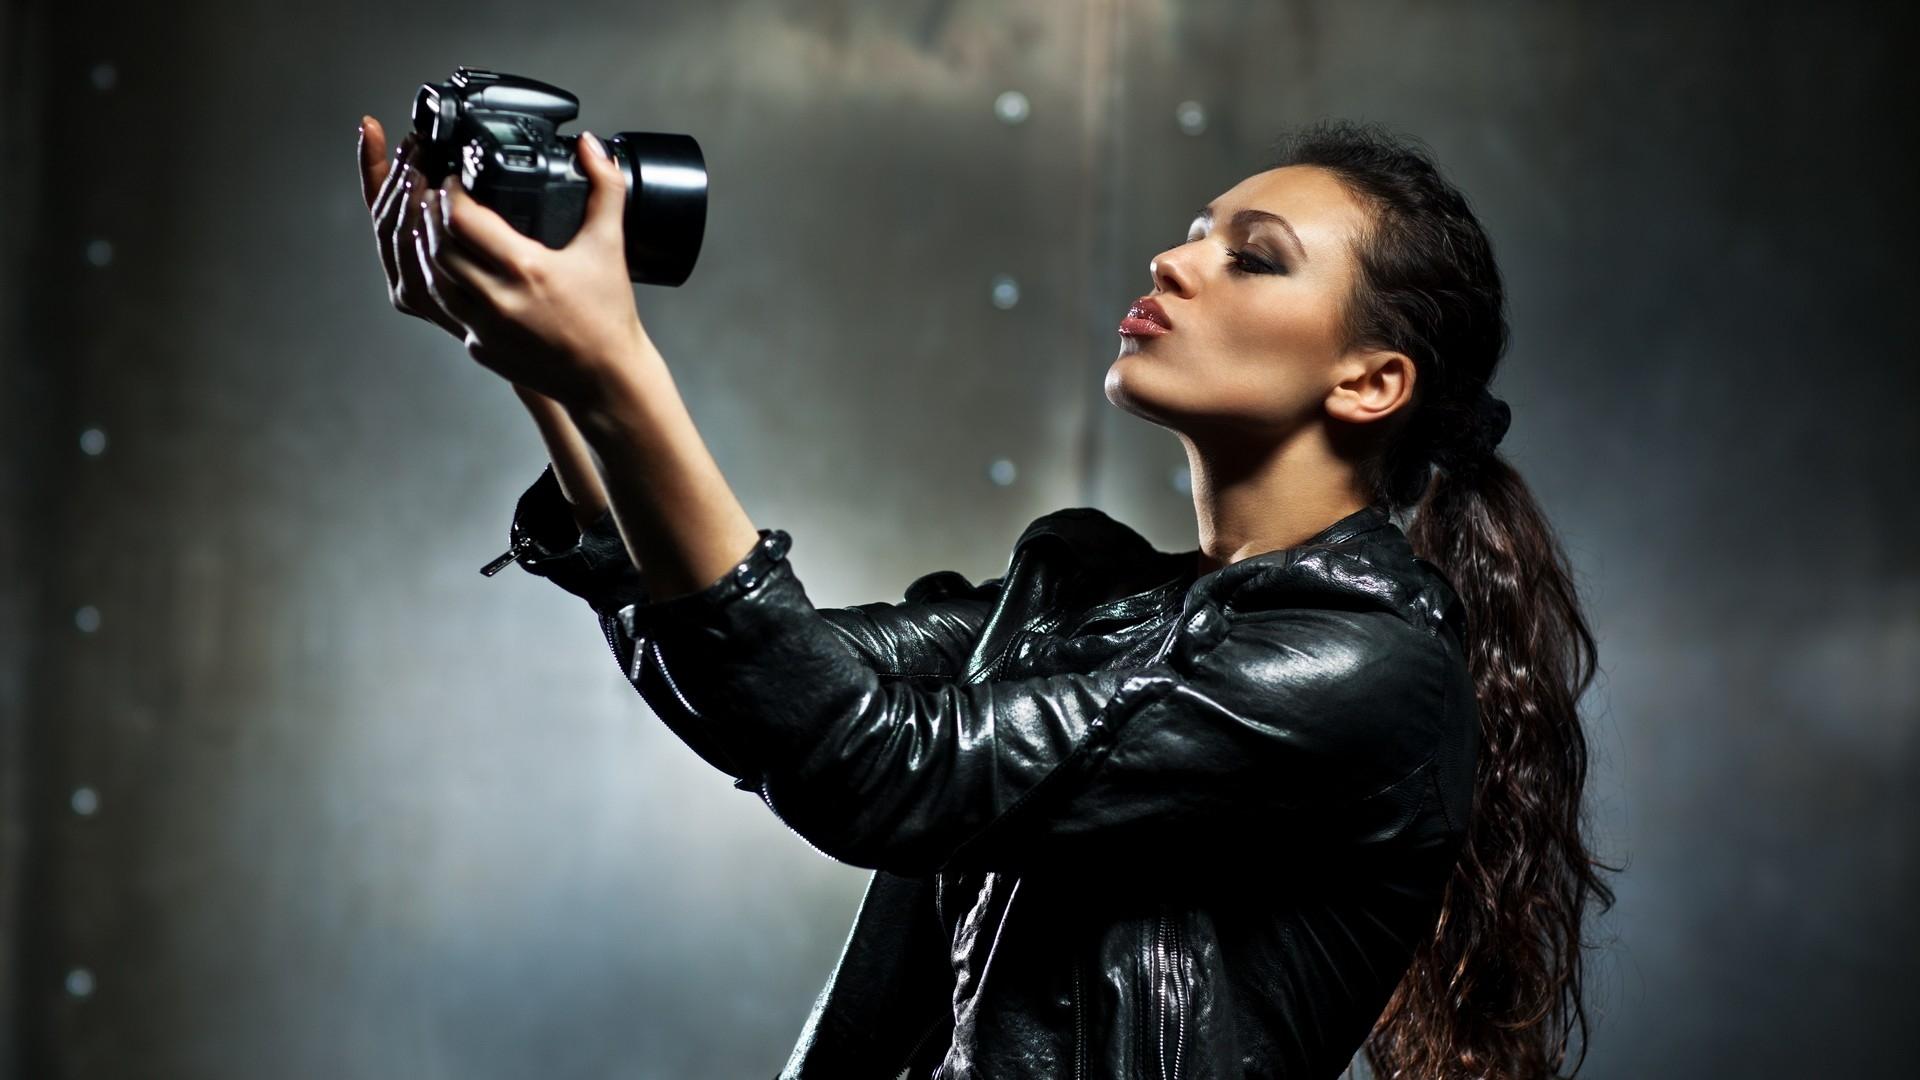 Картинки фоторедактор, фотосессия картинки реклама